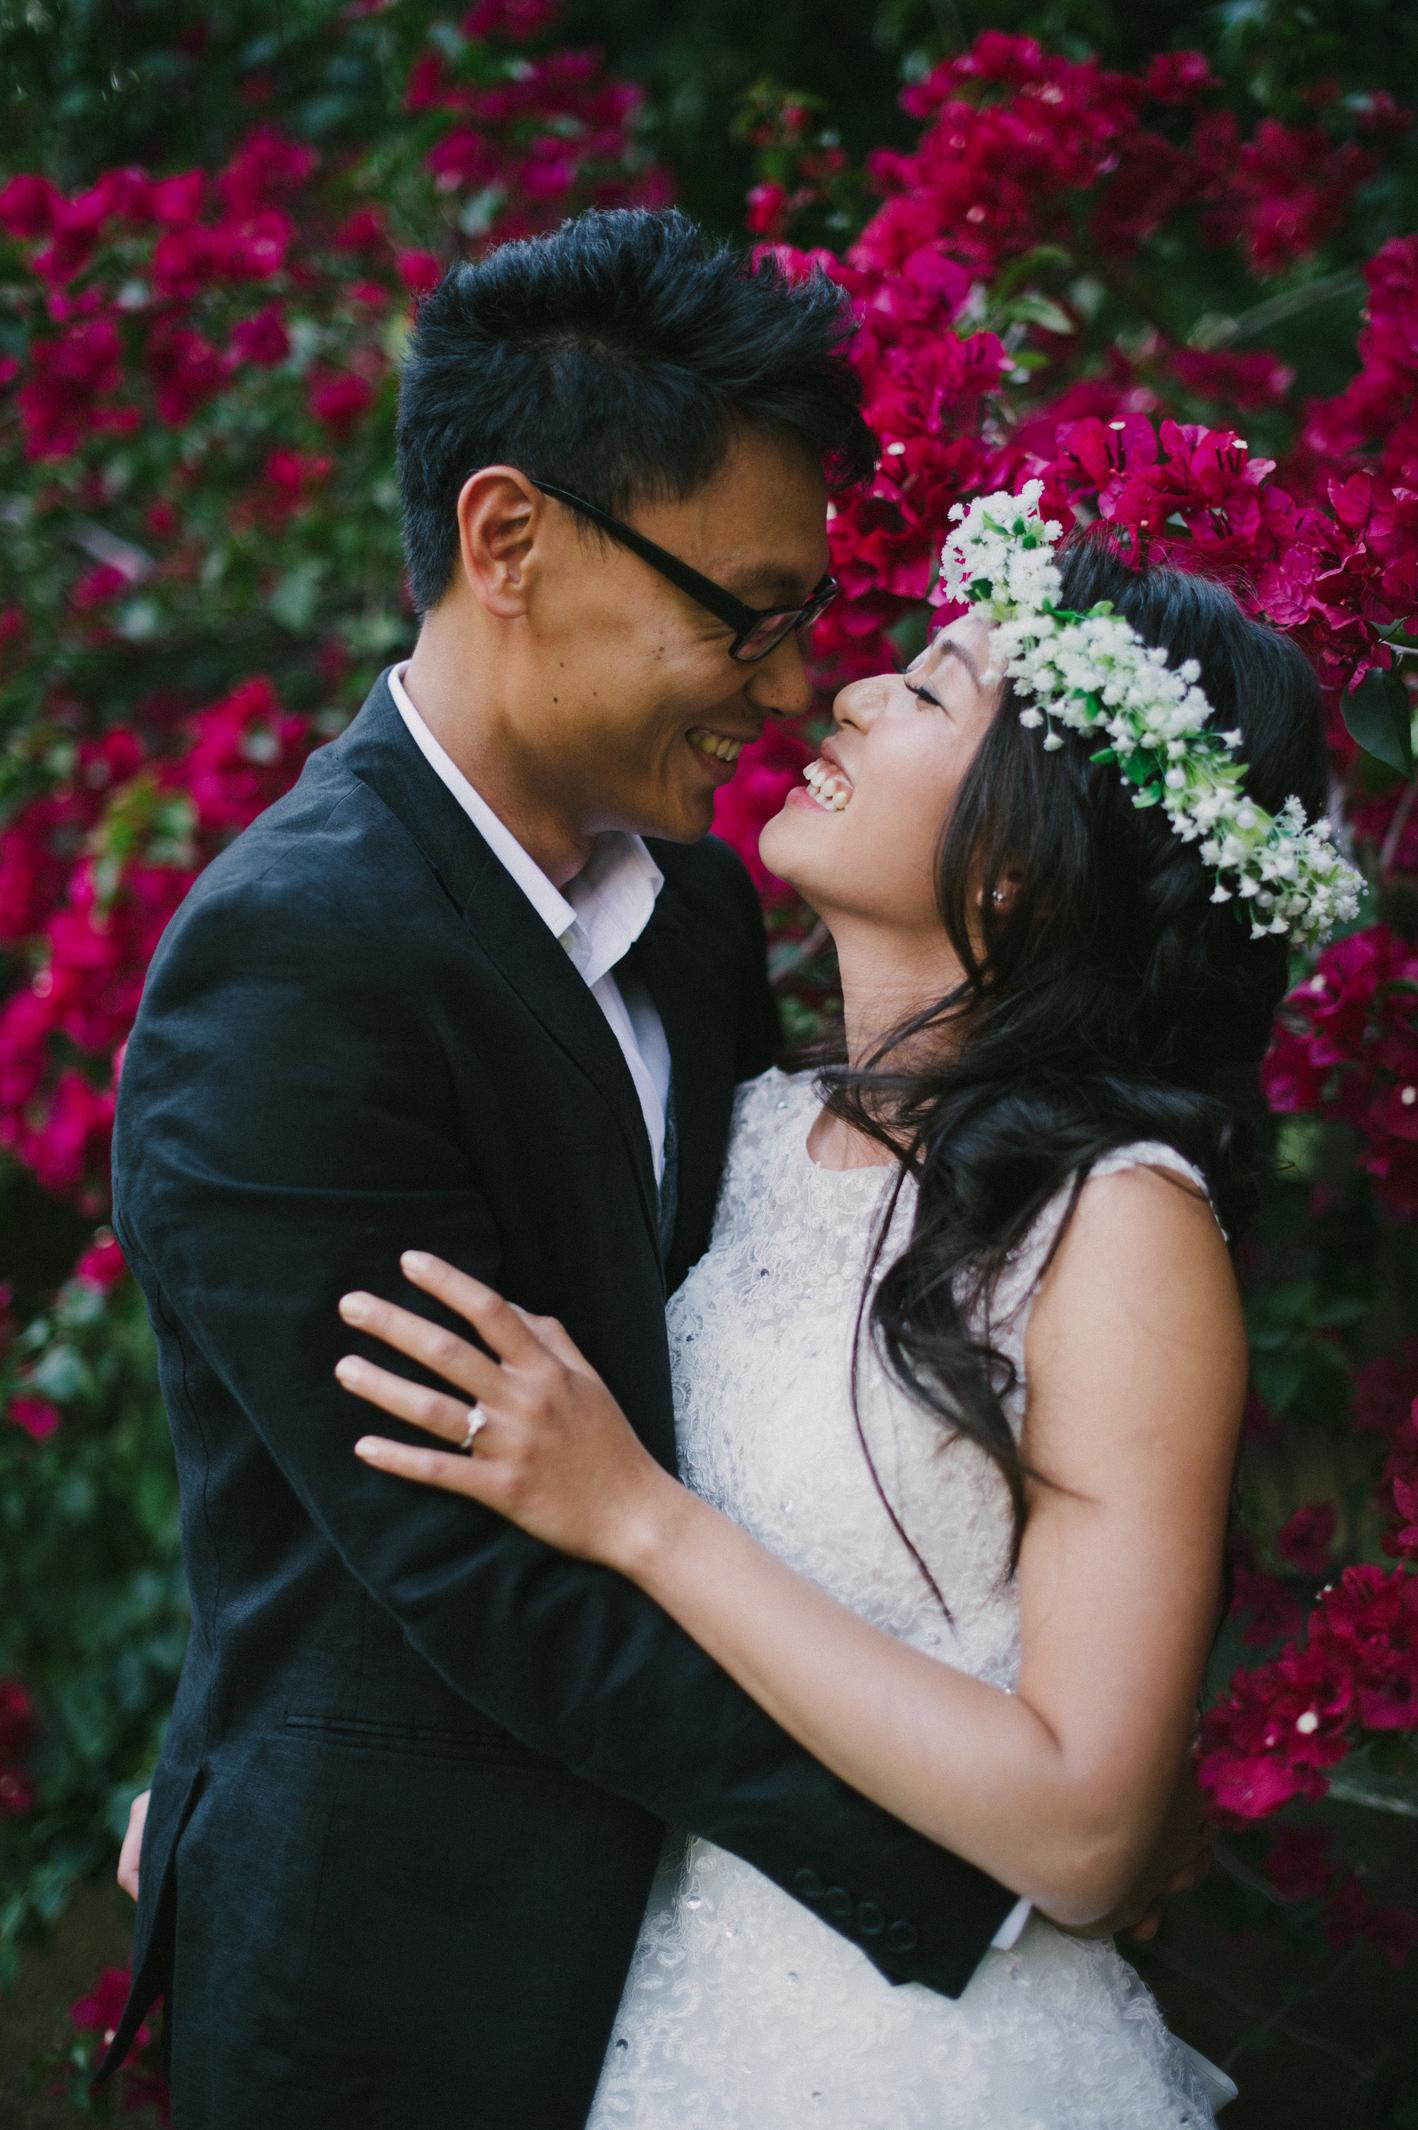 017-ed-janet-currumbin-wedding_sophie-baker-photography